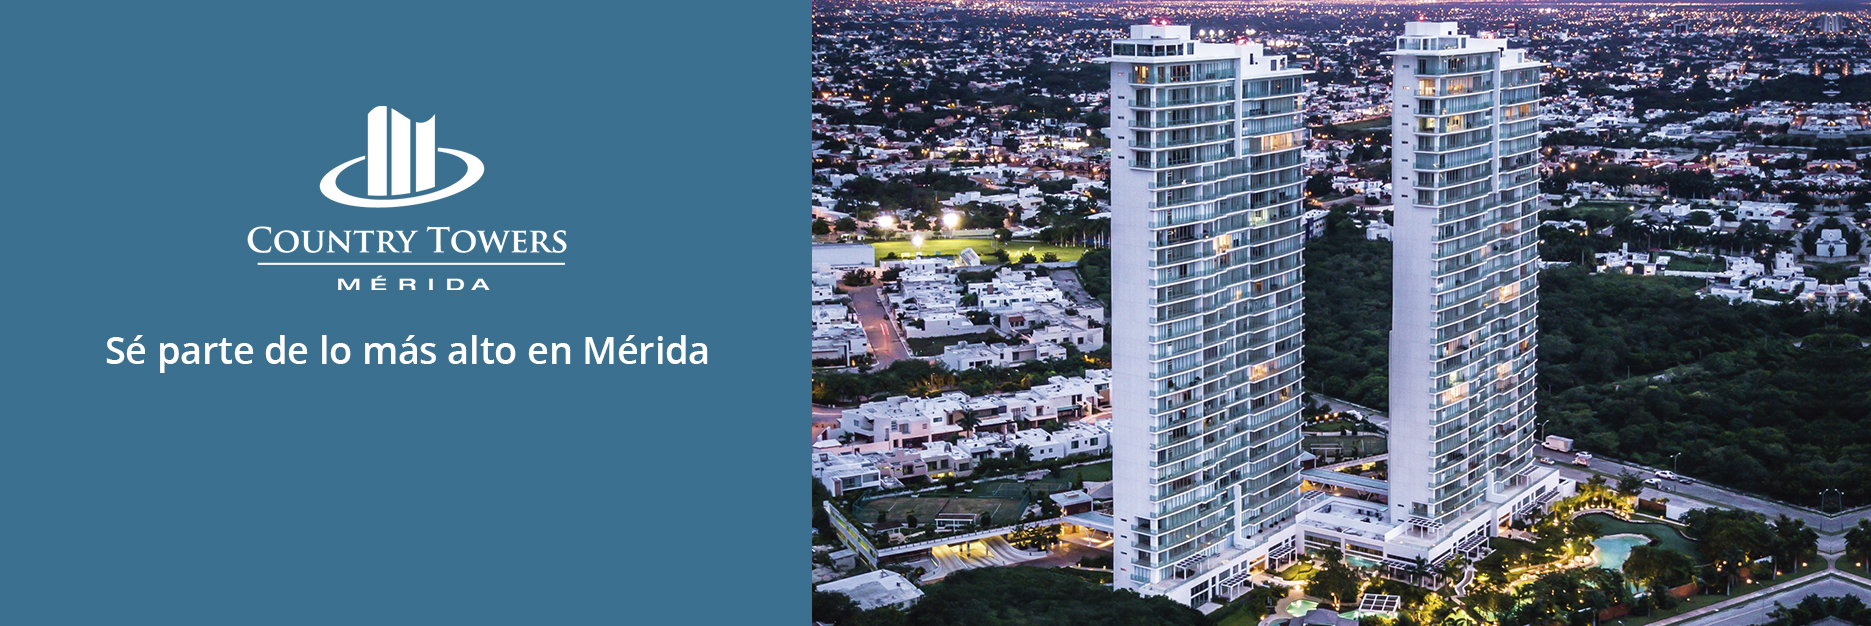 Departamentos Venta Mérida Country Towers Goodlers